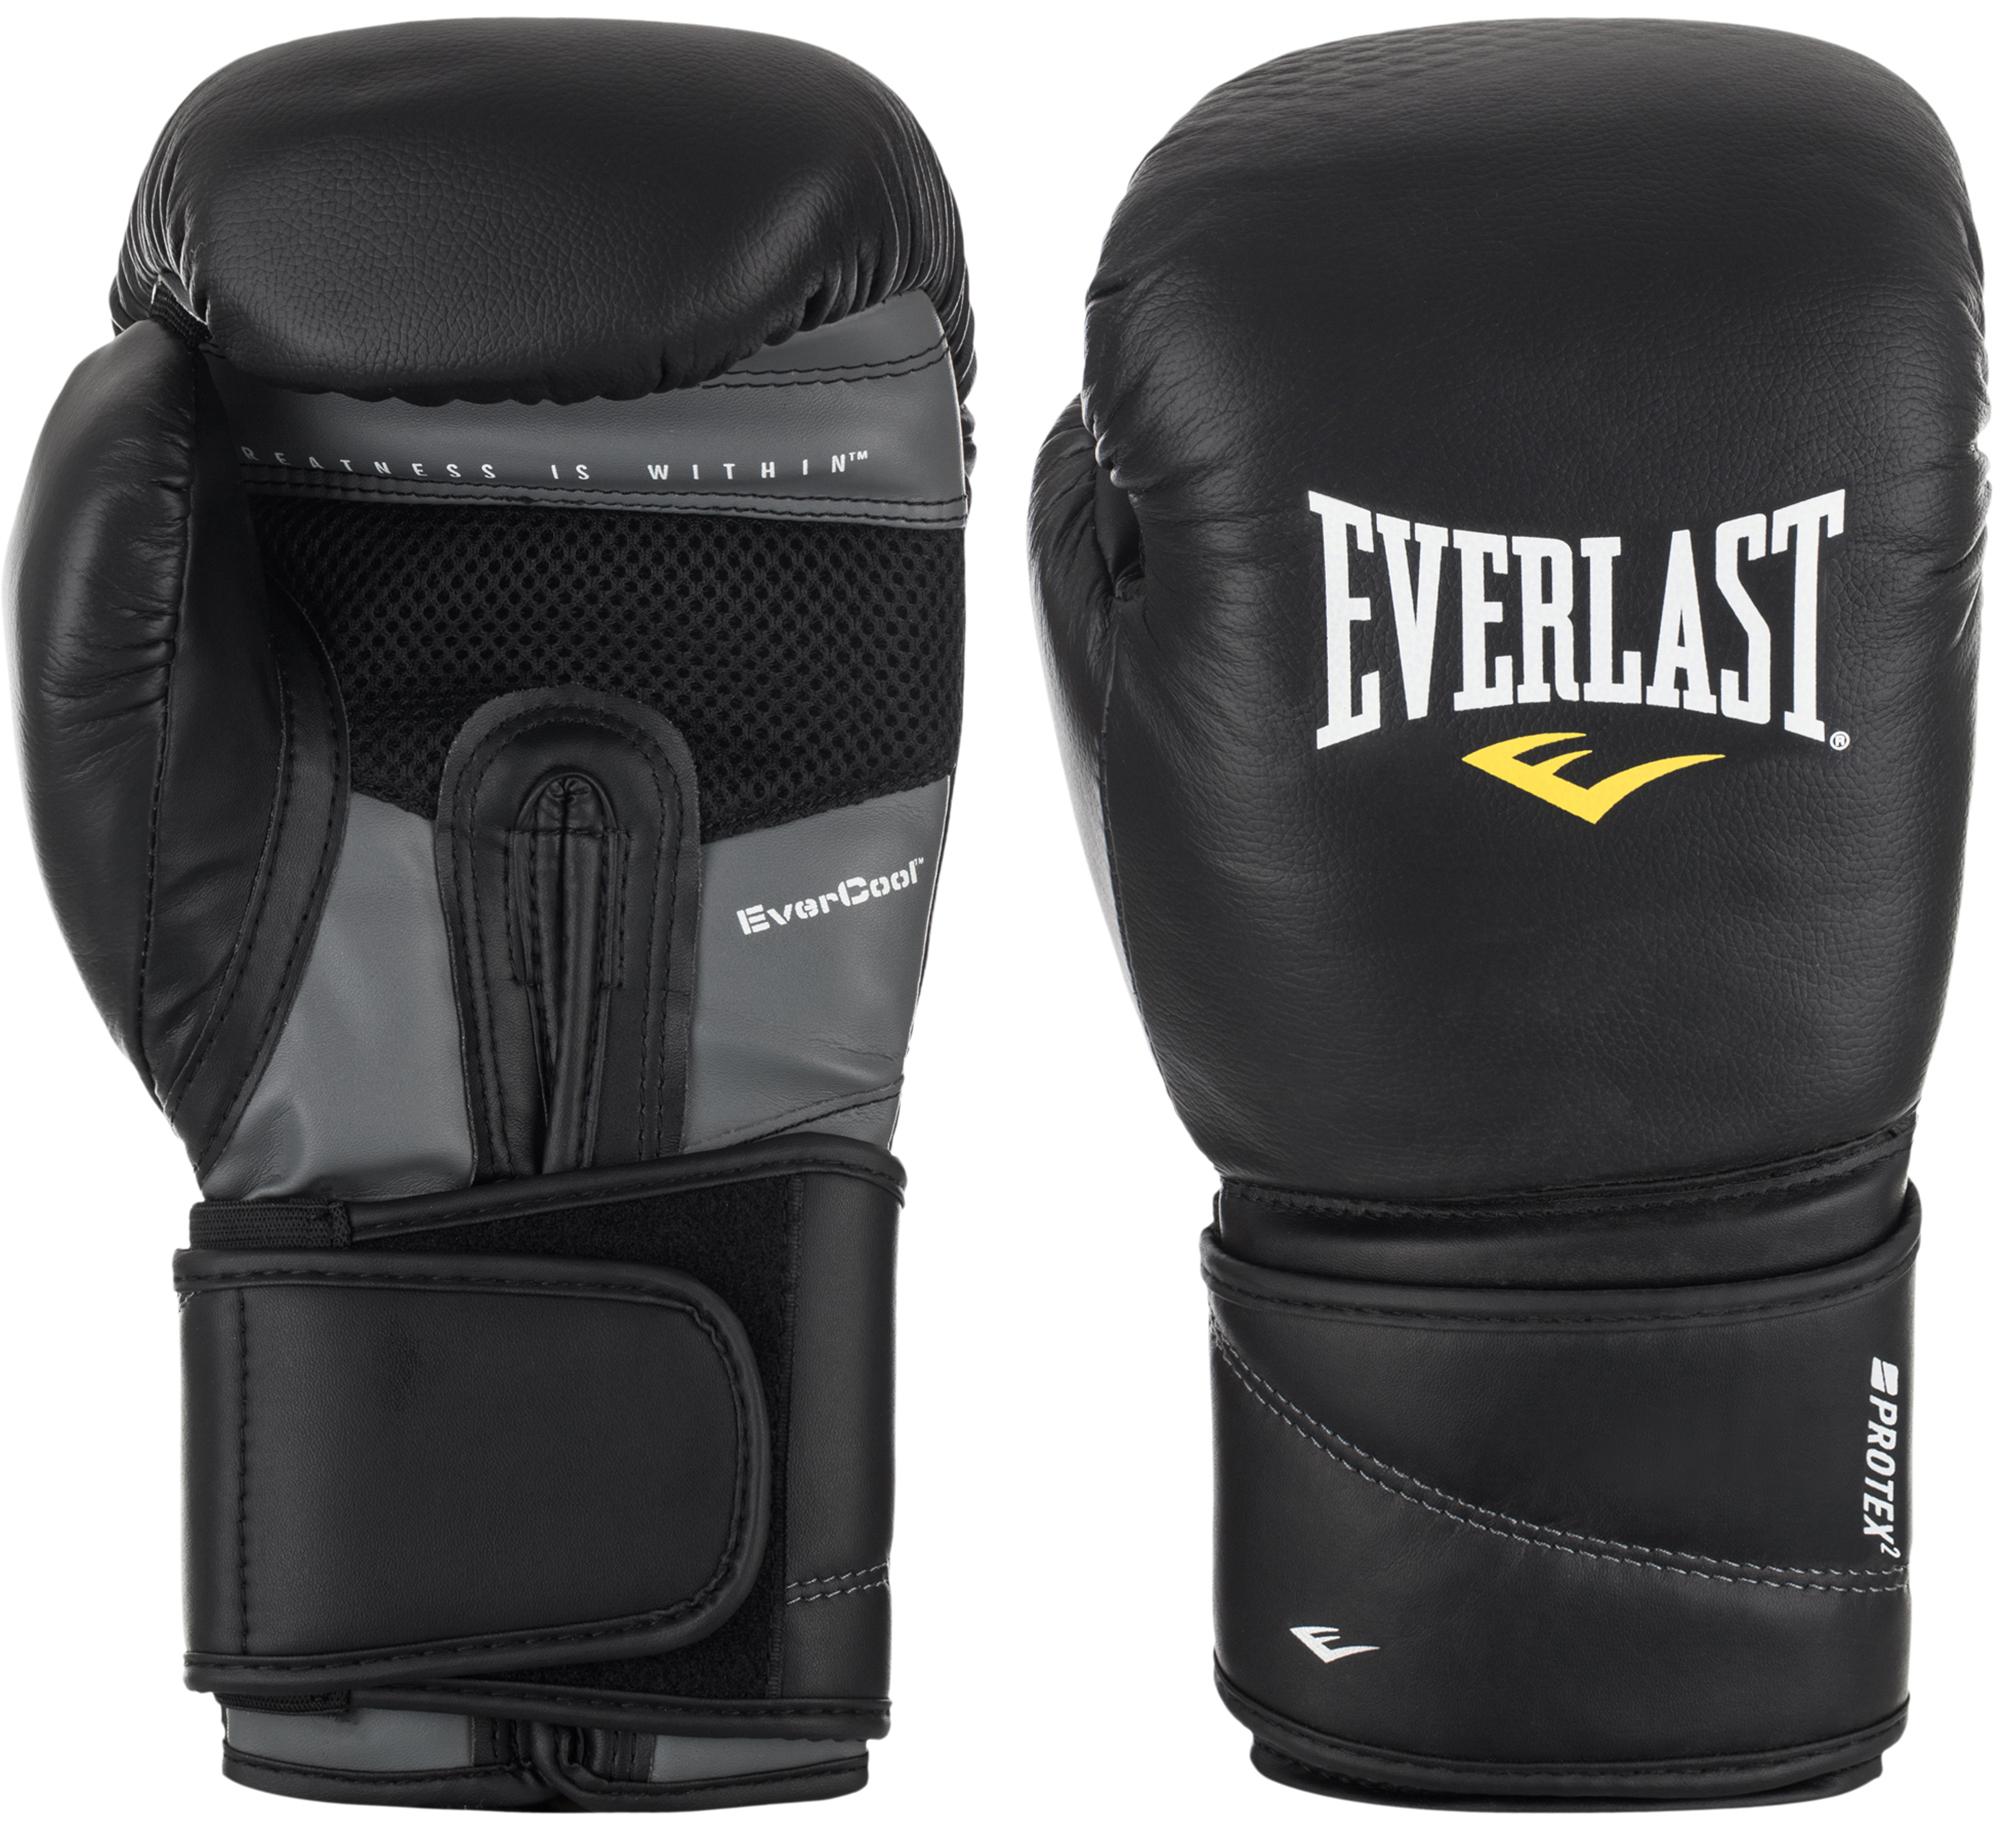 Everlast Перчатки боксерские Everlast Protex2 Leather, размер 14 oz/S-M